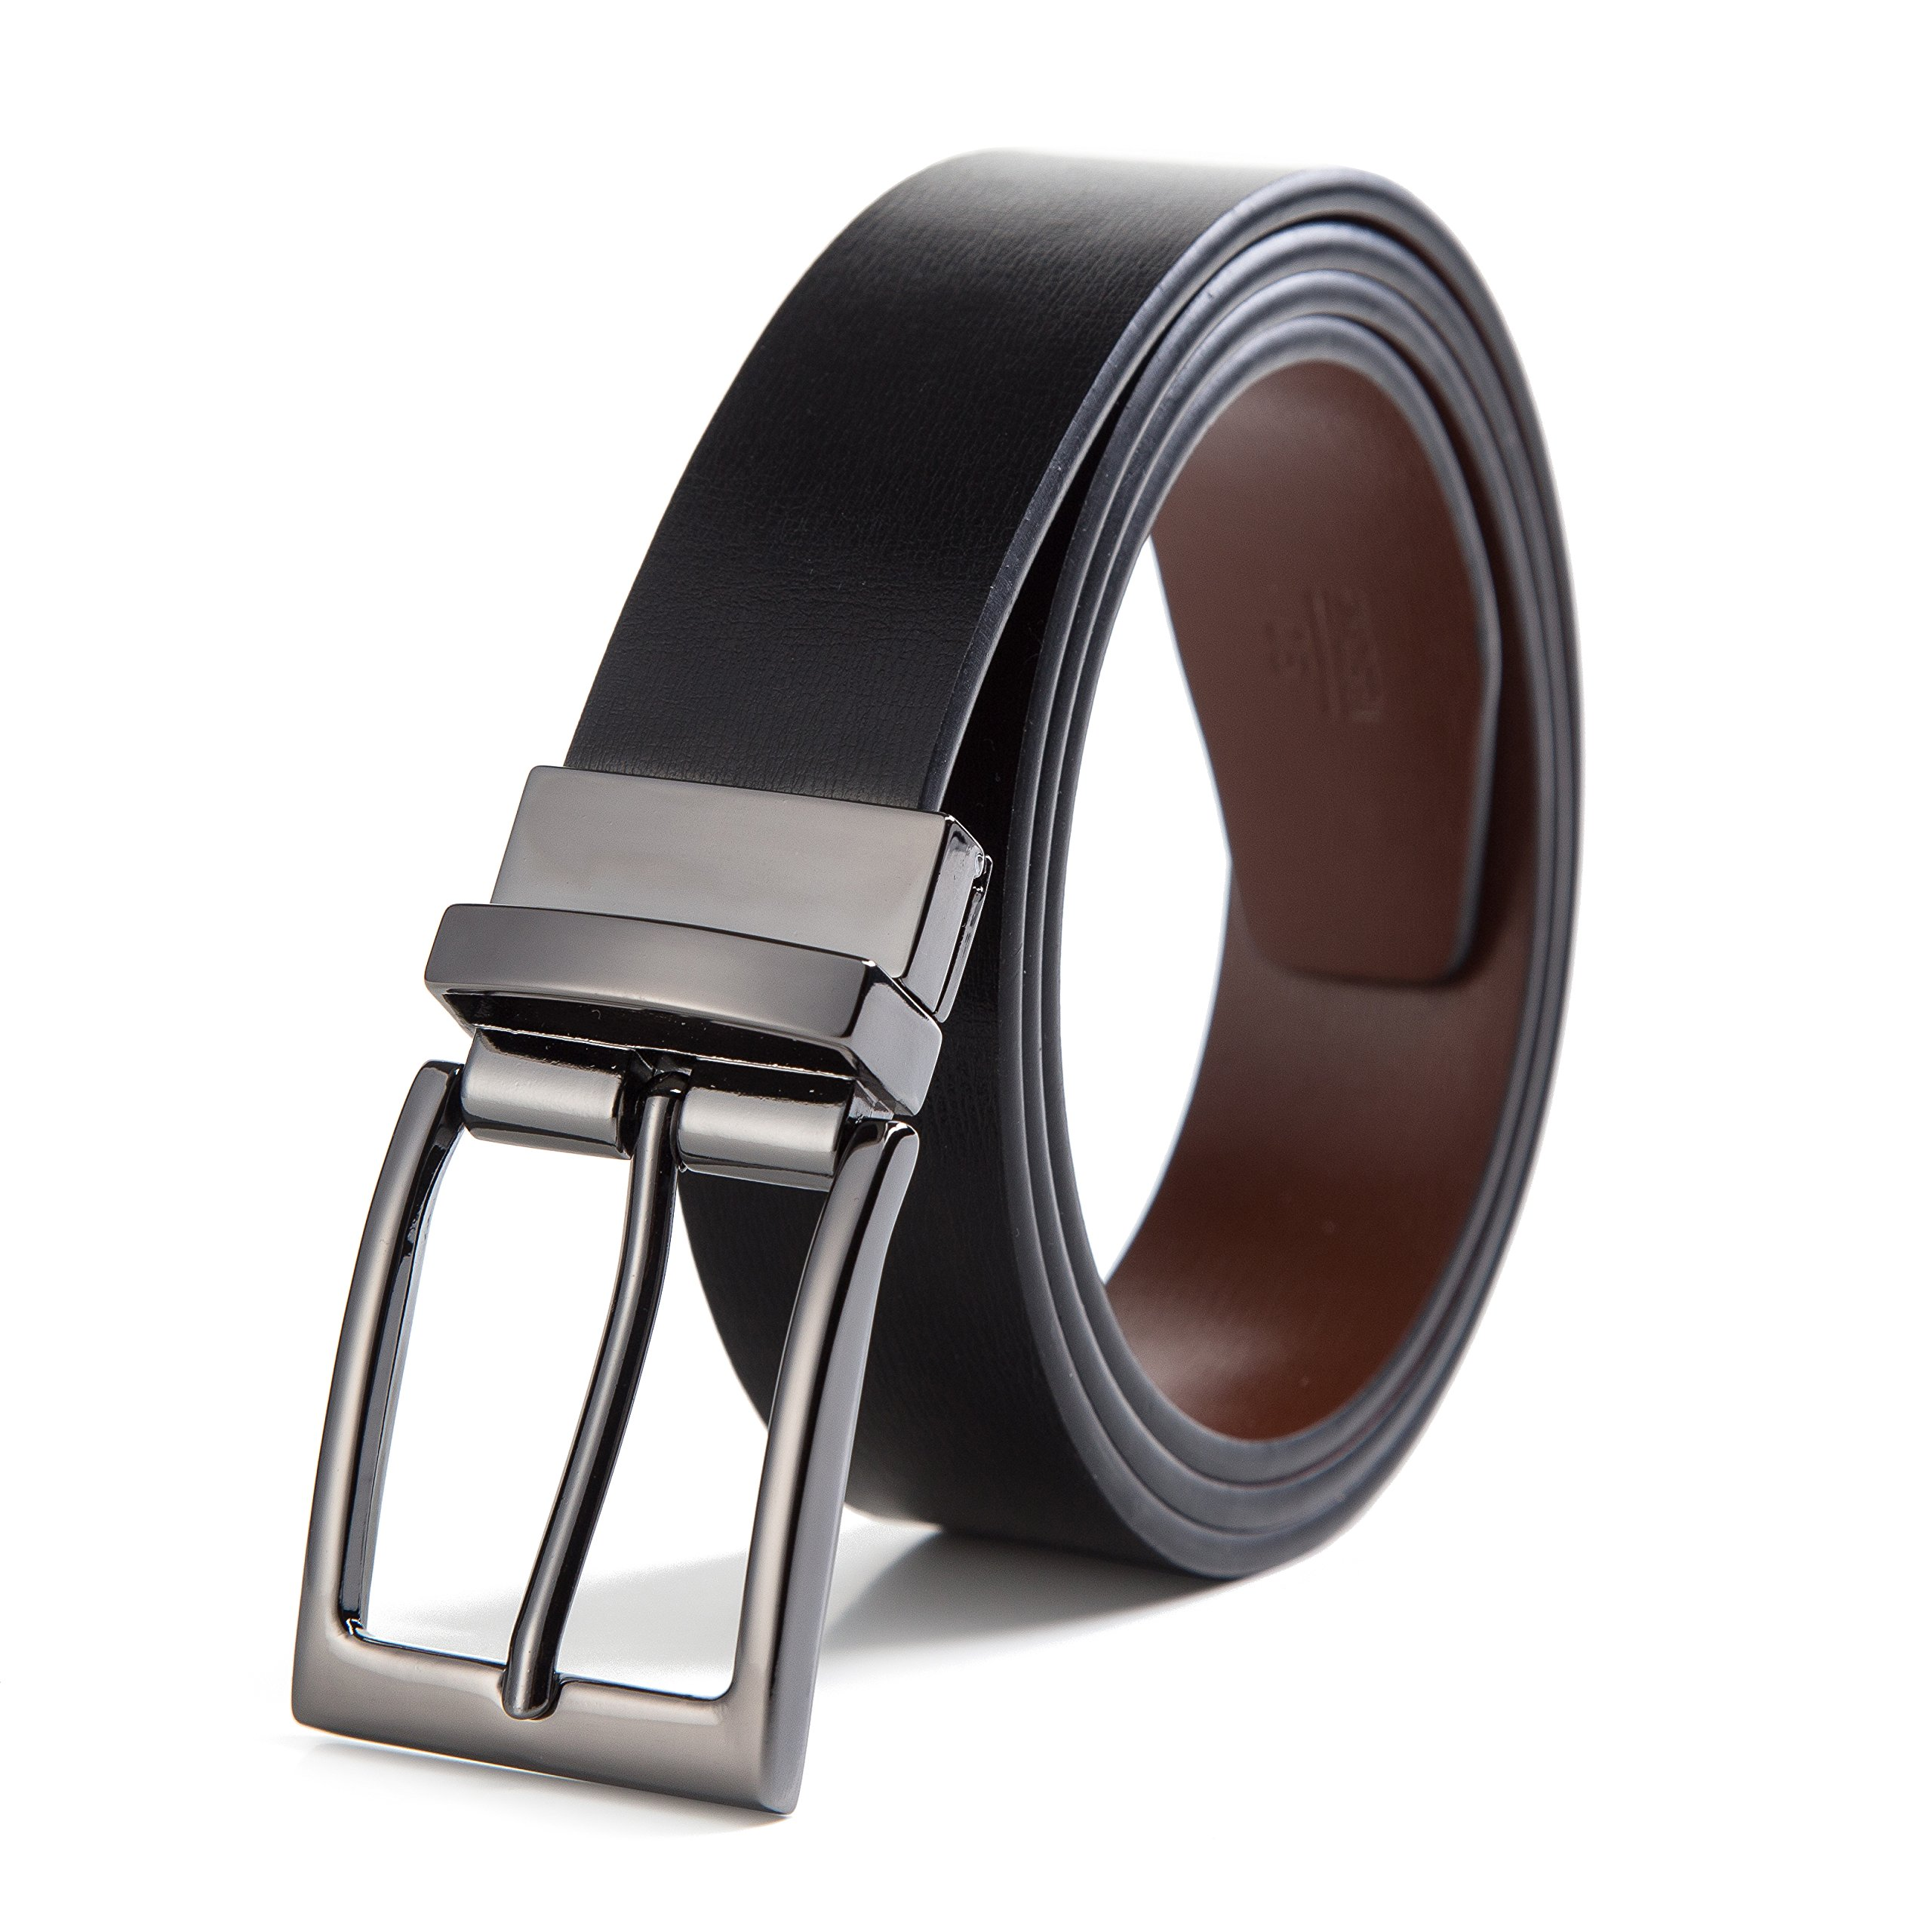 XAvoe Men's Genuine Leather Ratchet Belt Automatic Slide Buckle 1 3/8 Width (Reversible prong belt Black/Brown Style 1, Waist Size 26'' - 43'')